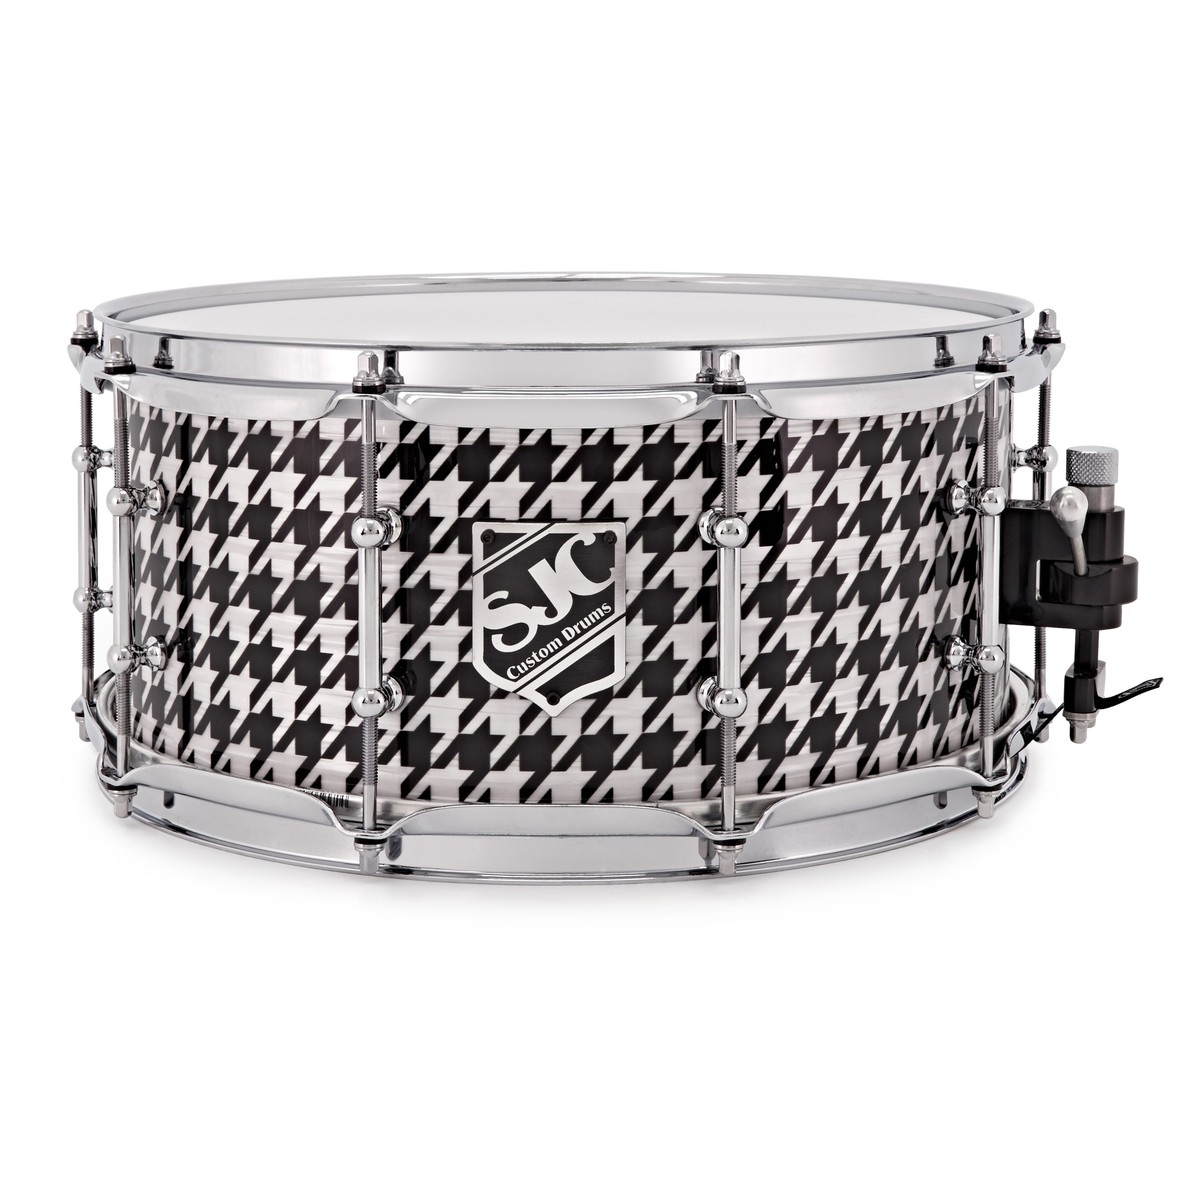 SJC Drums Tré Cool Signature 14 x 6.5 Snare Drum, Houndstooth at ...